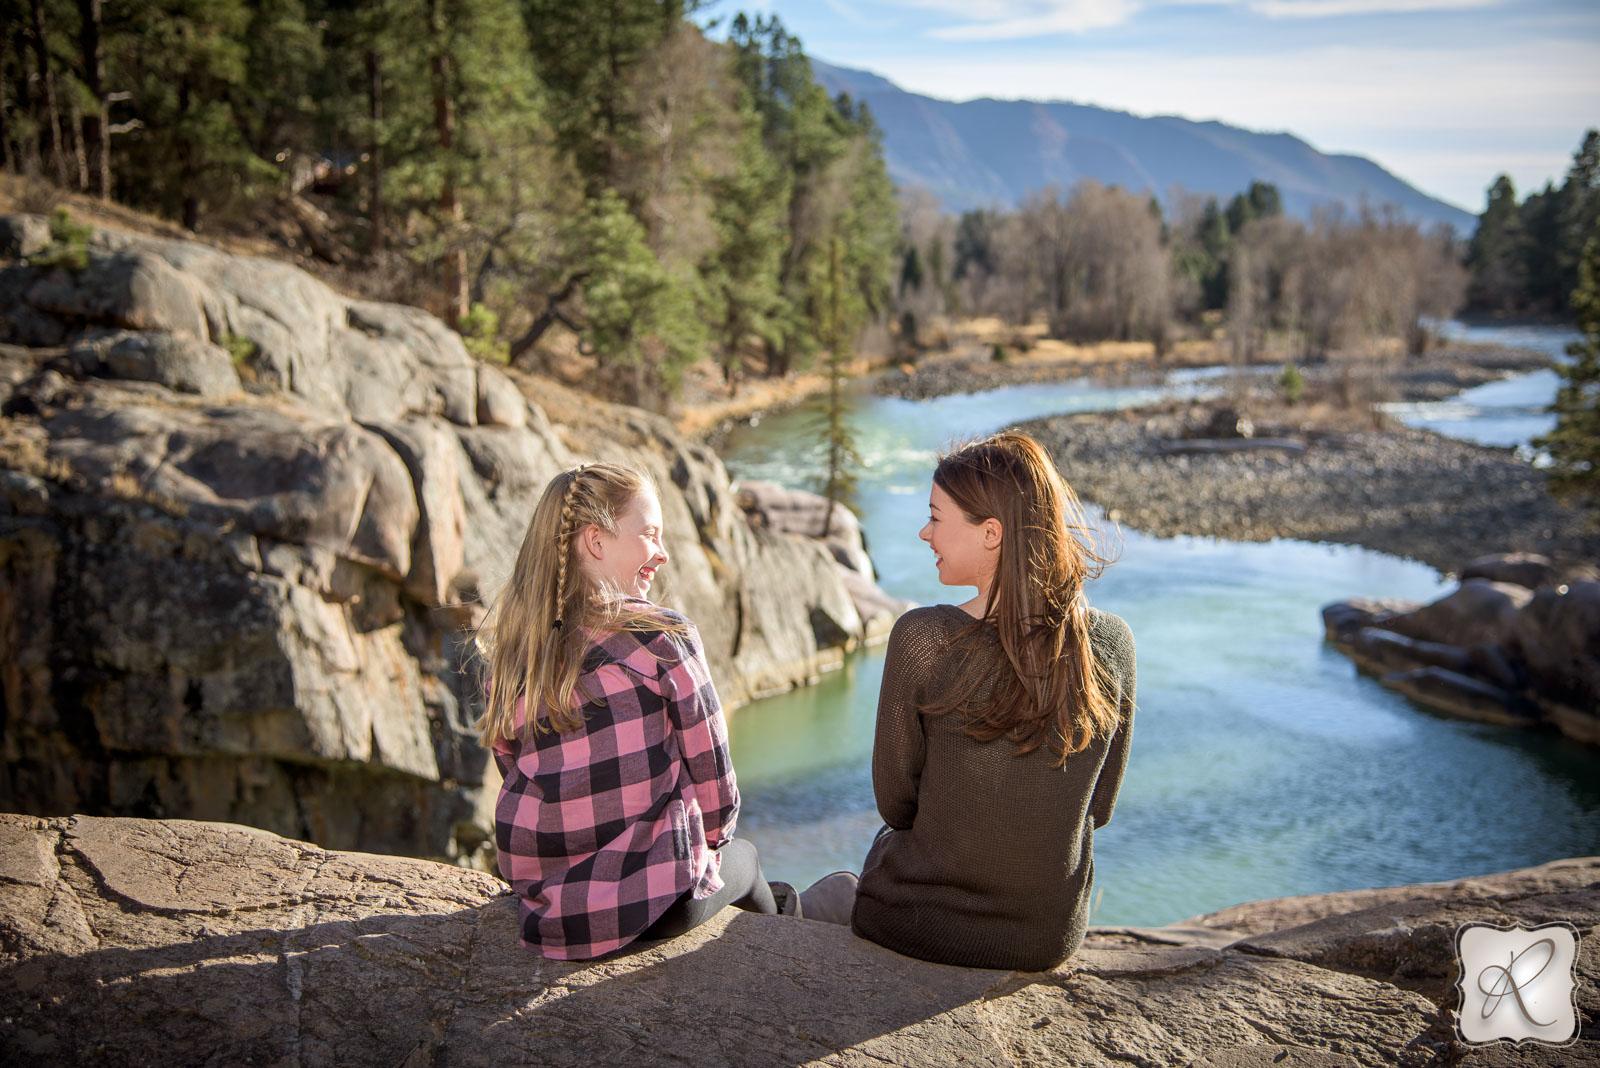 outdoor professional photography in Durango Colorado